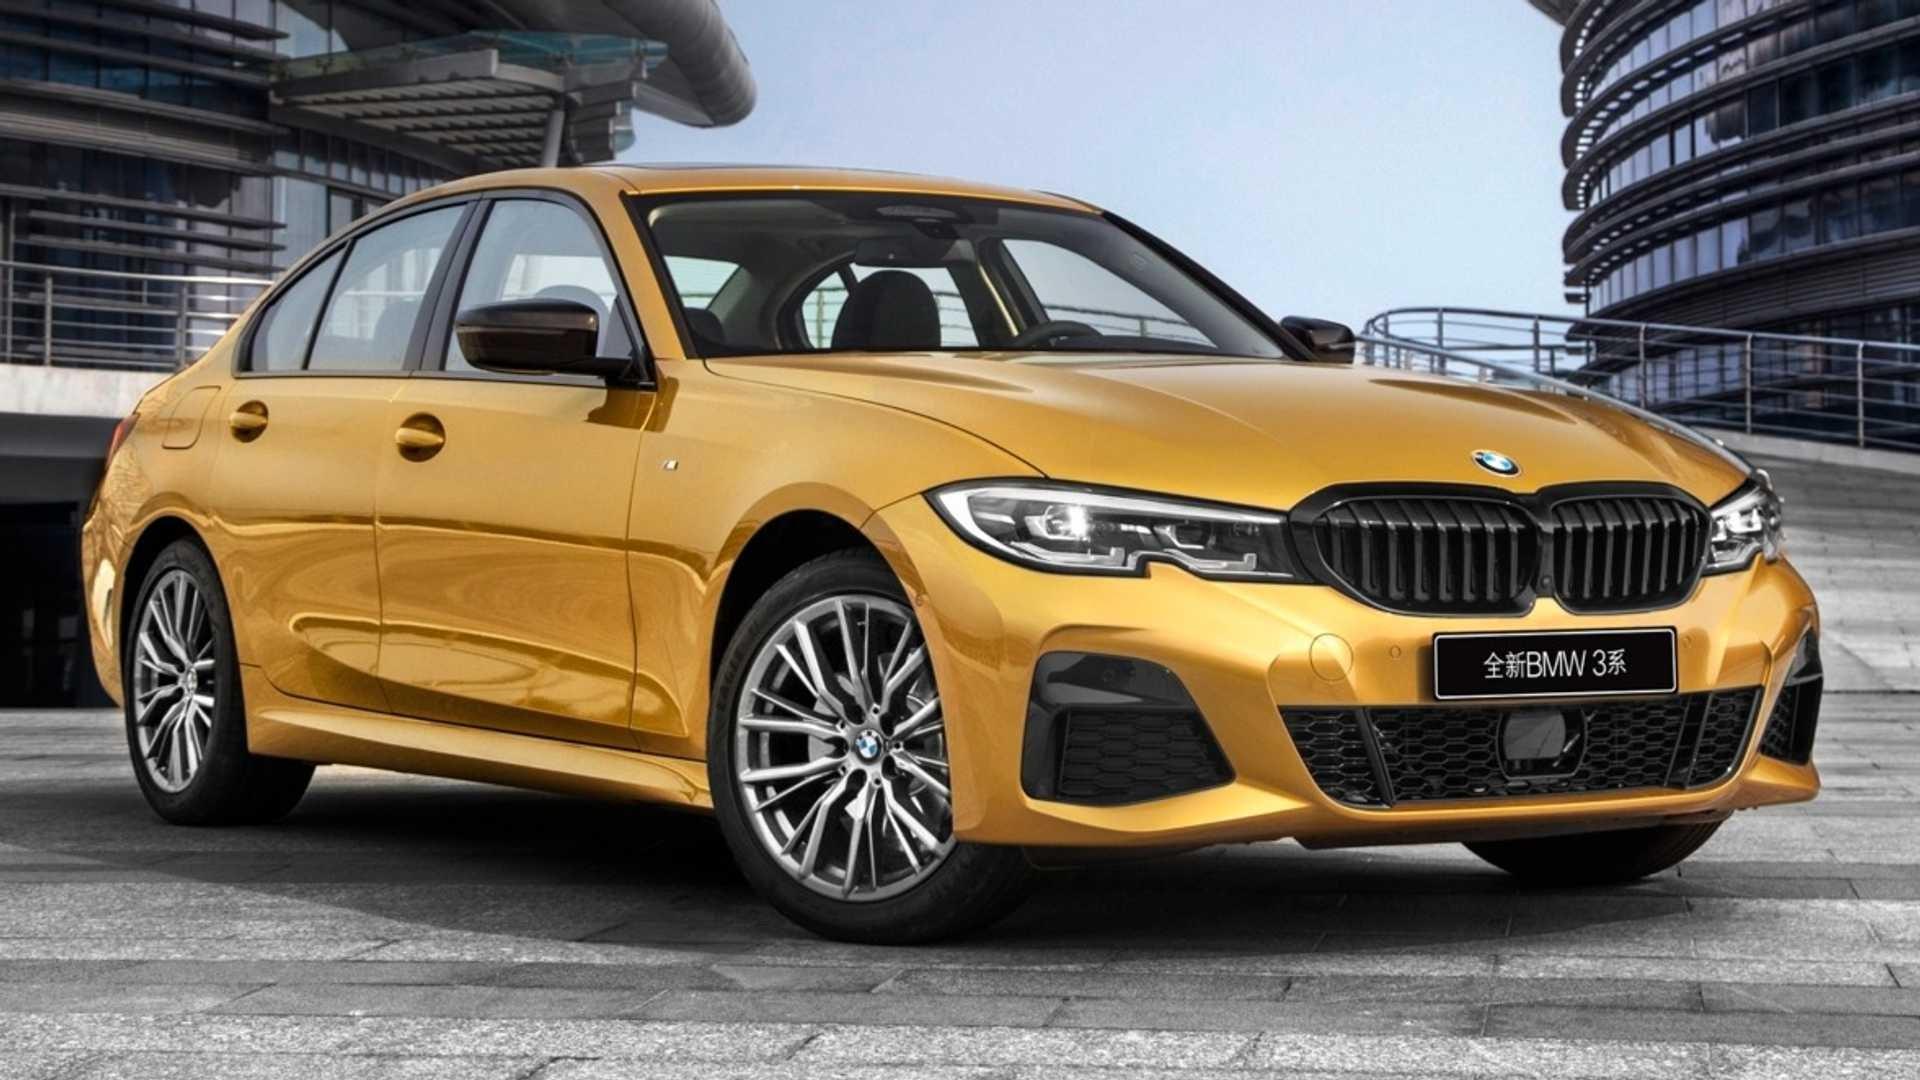 BMW-3-Series-LWB-Long-Wheelbase-2019-3